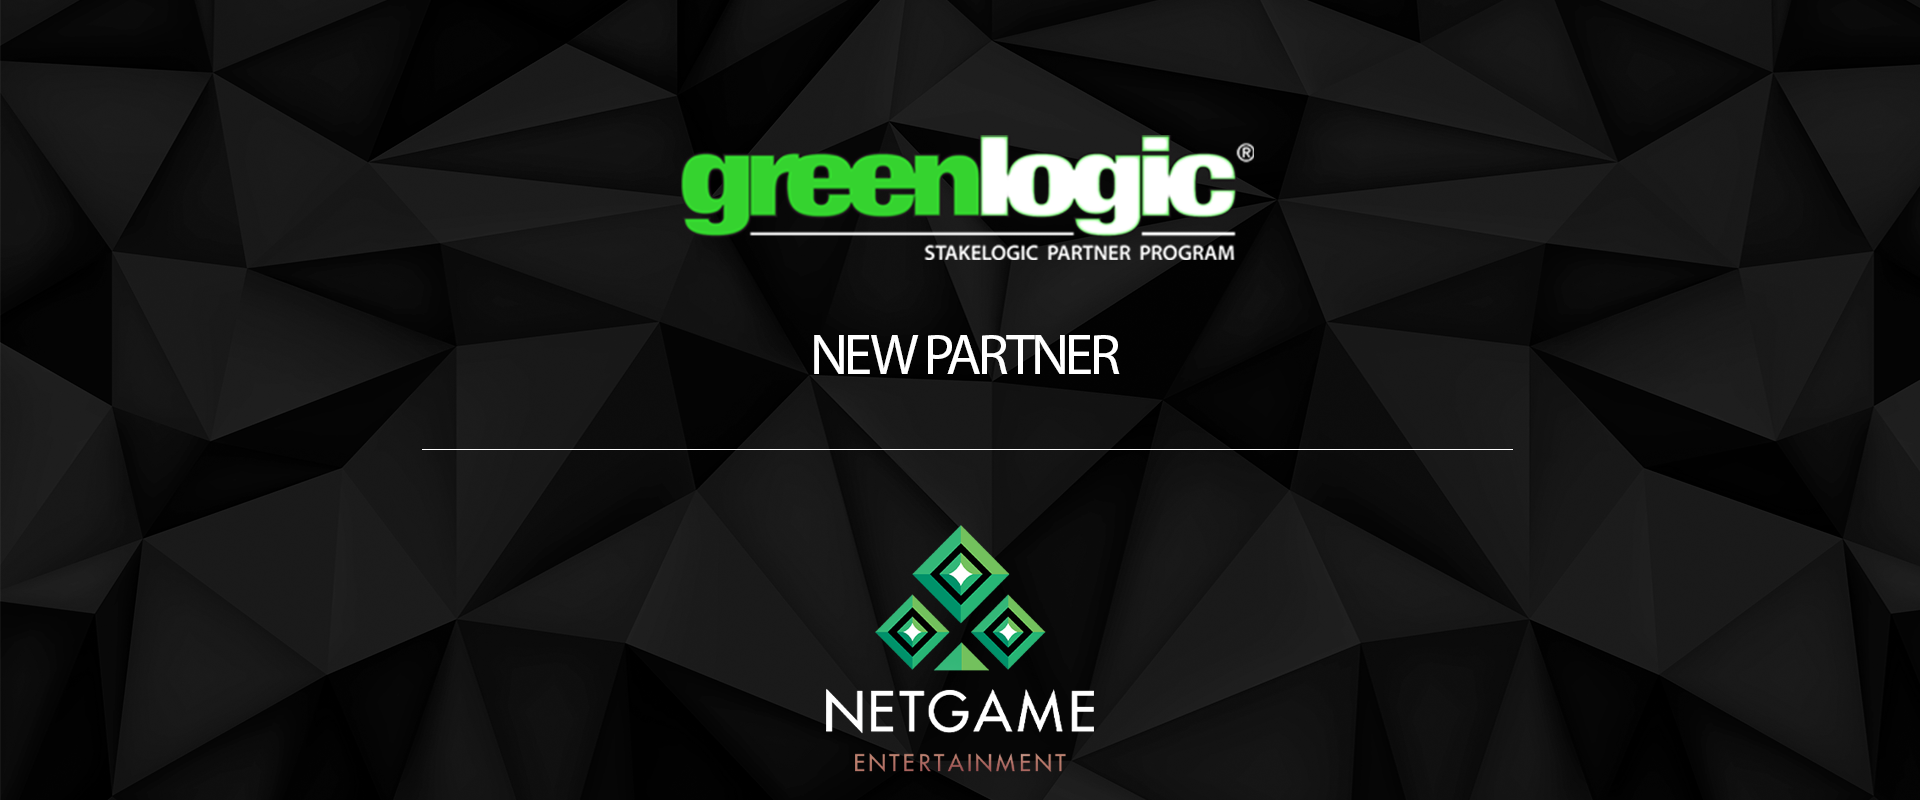 Greenlogic New Partner Netgame